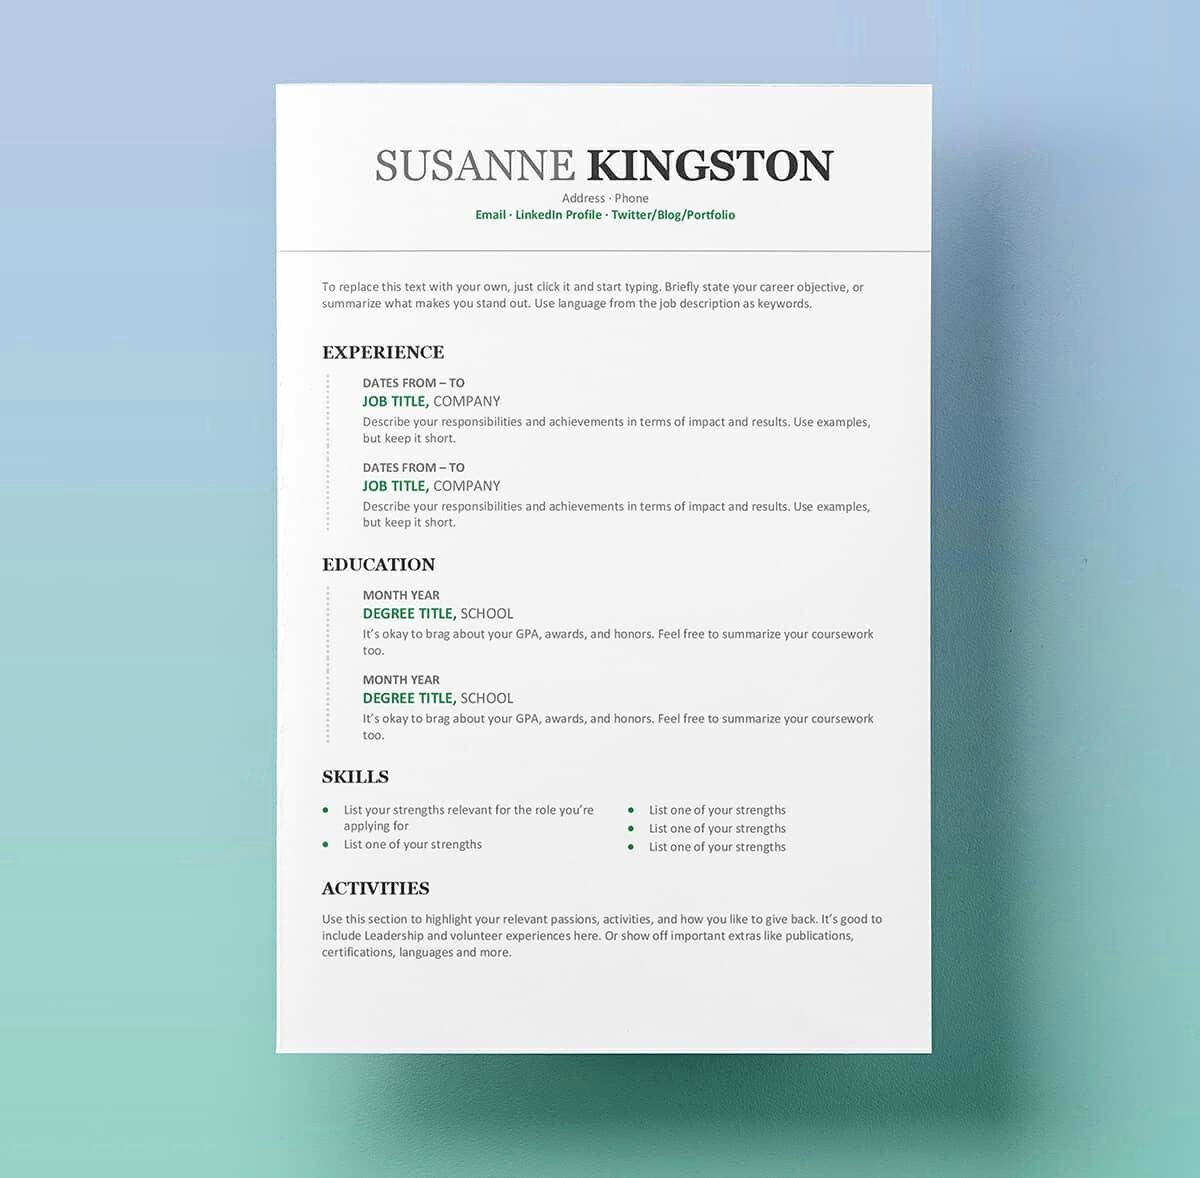 Best Ms Word Resume Templates Fresh Best Resume Templates Word Annecarolynbird